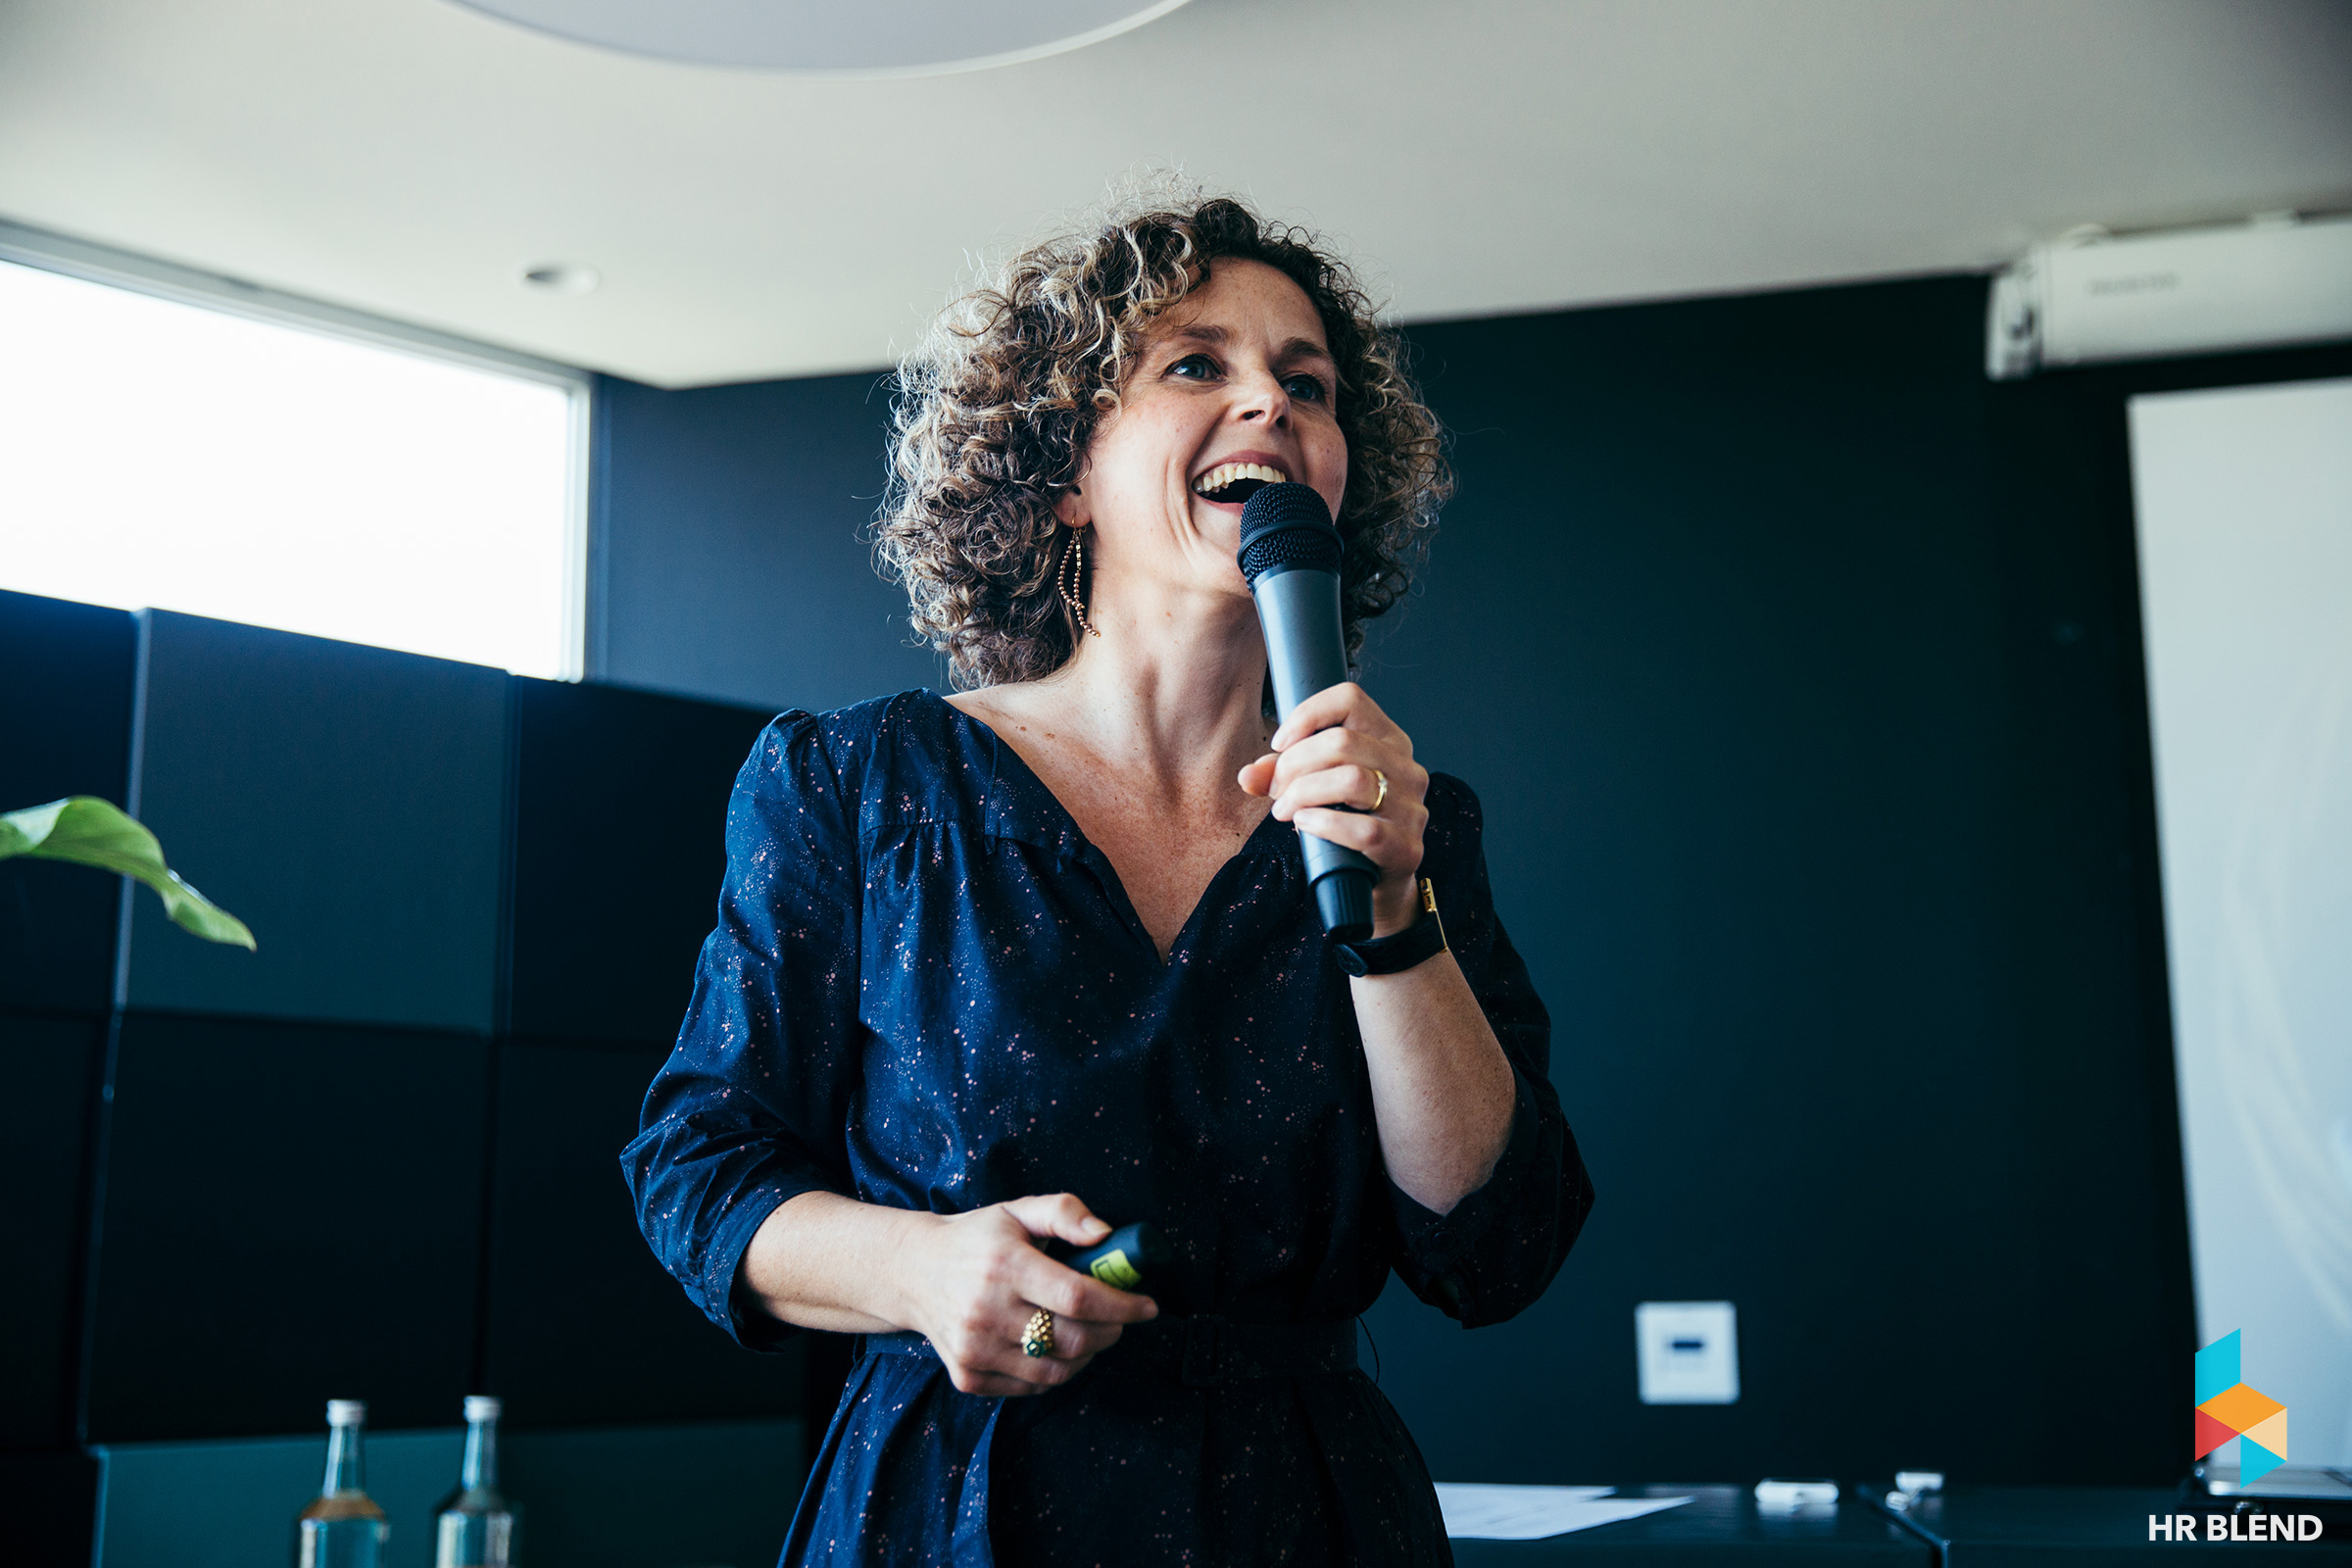 HR Blend storytelling Appical